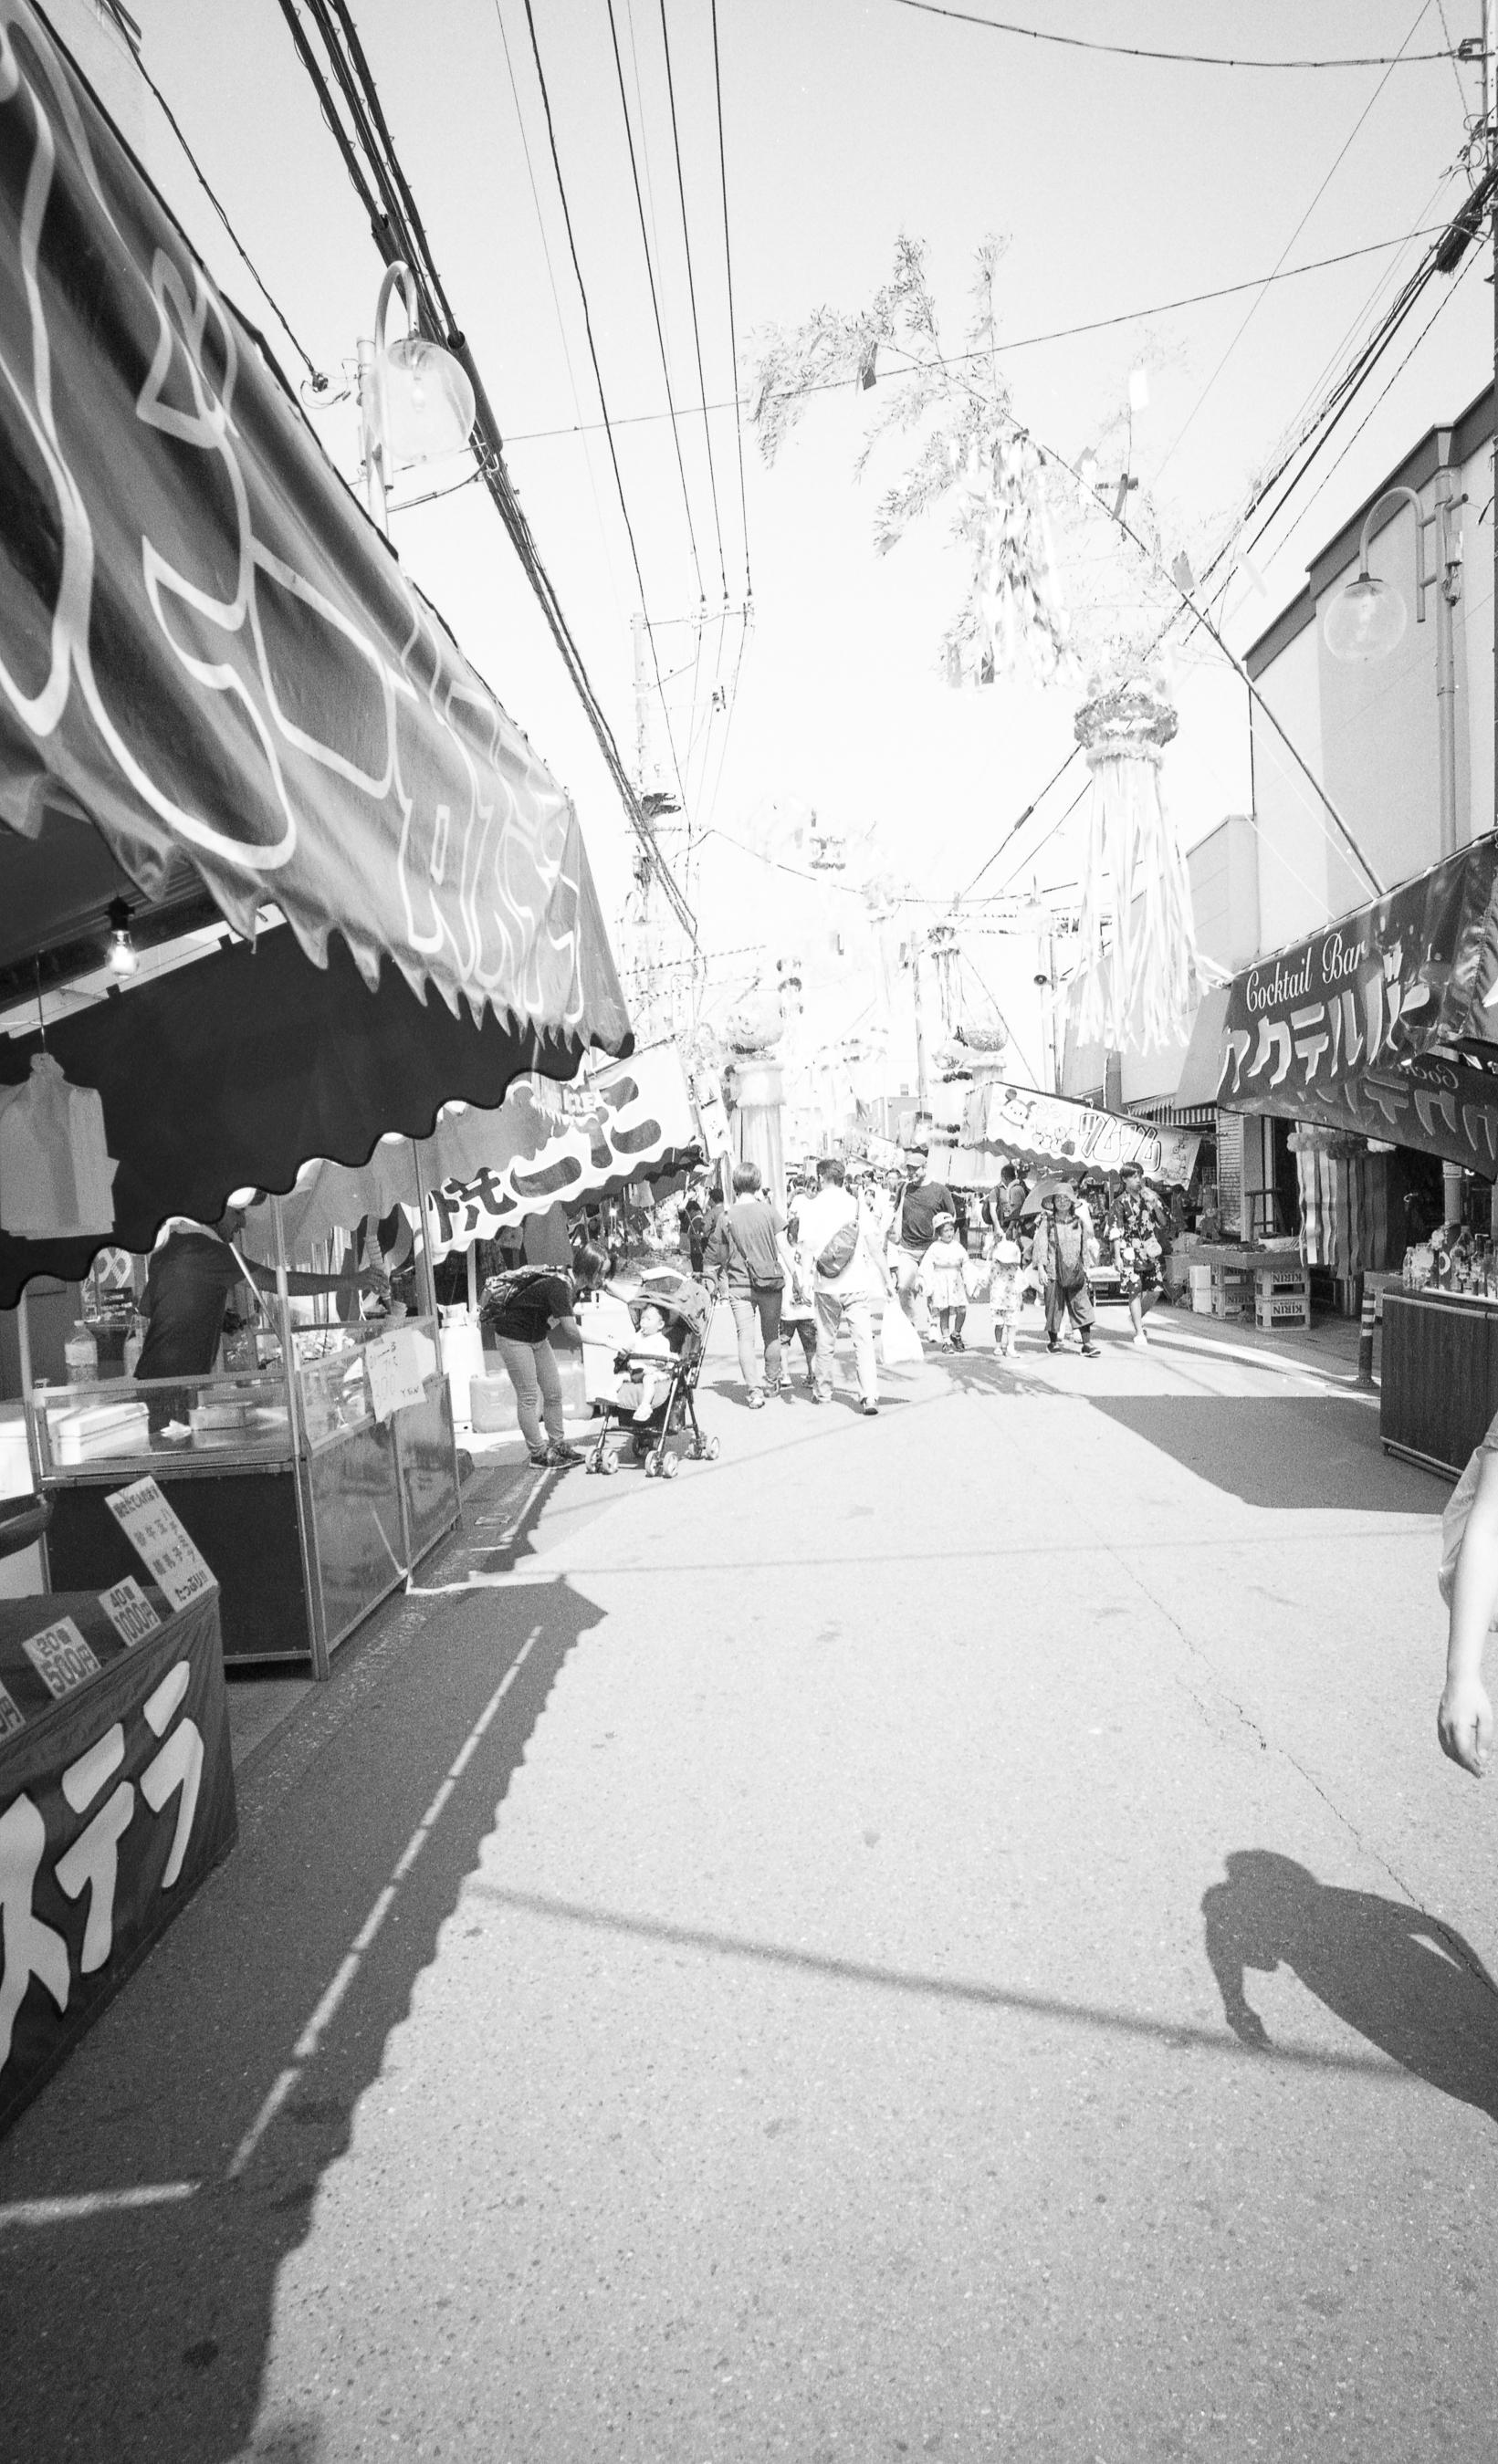 f:id:aoyama-takuro:20181103080844j:plain